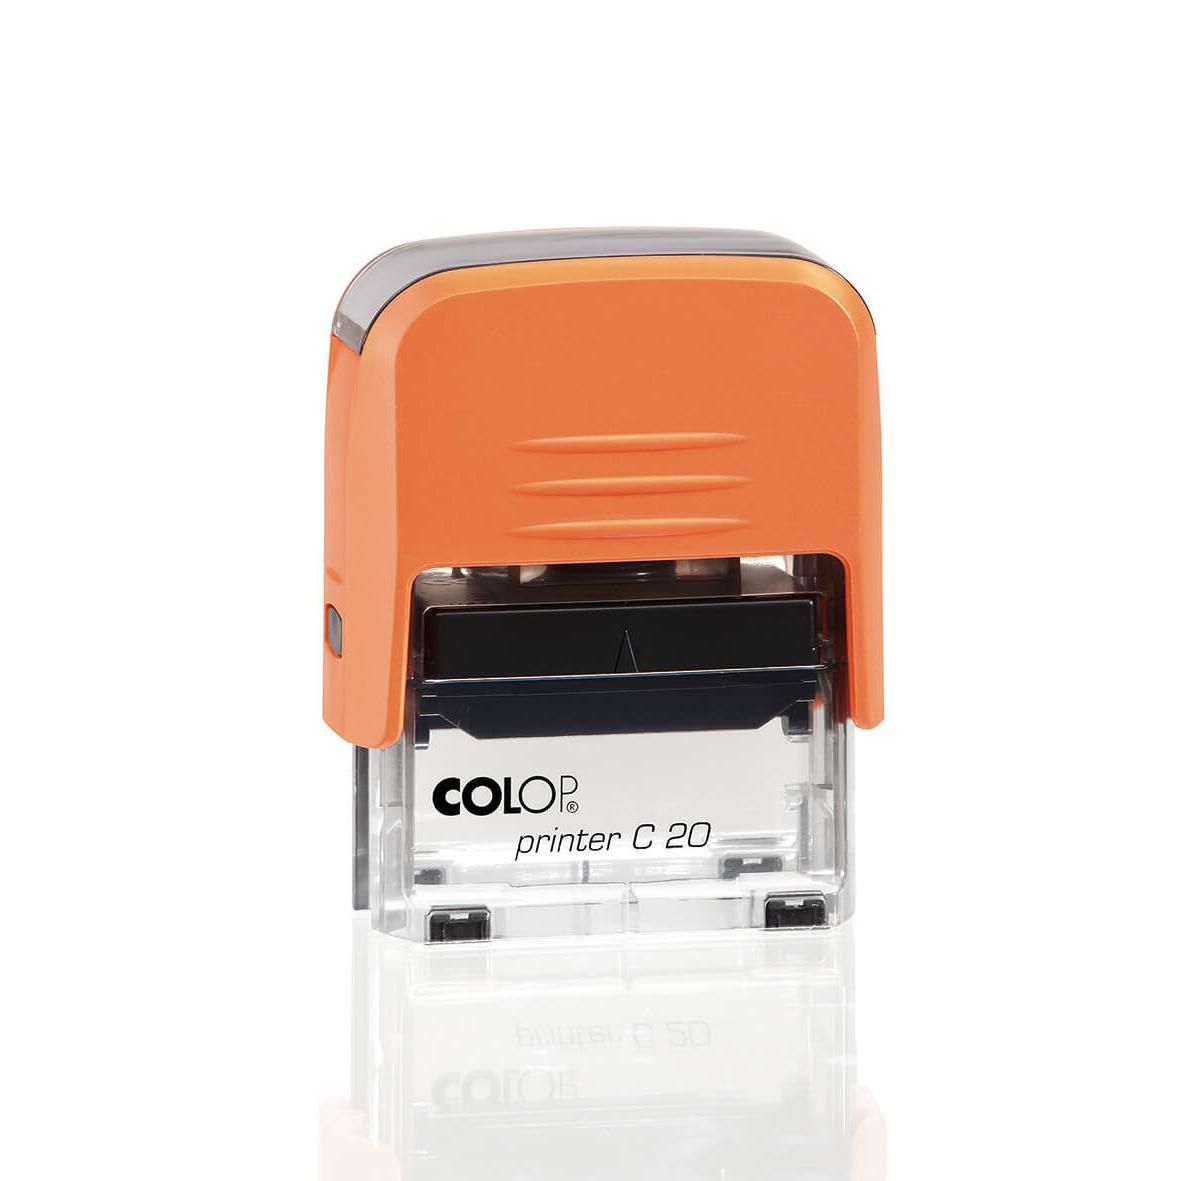 colop printer c20 оранжевый